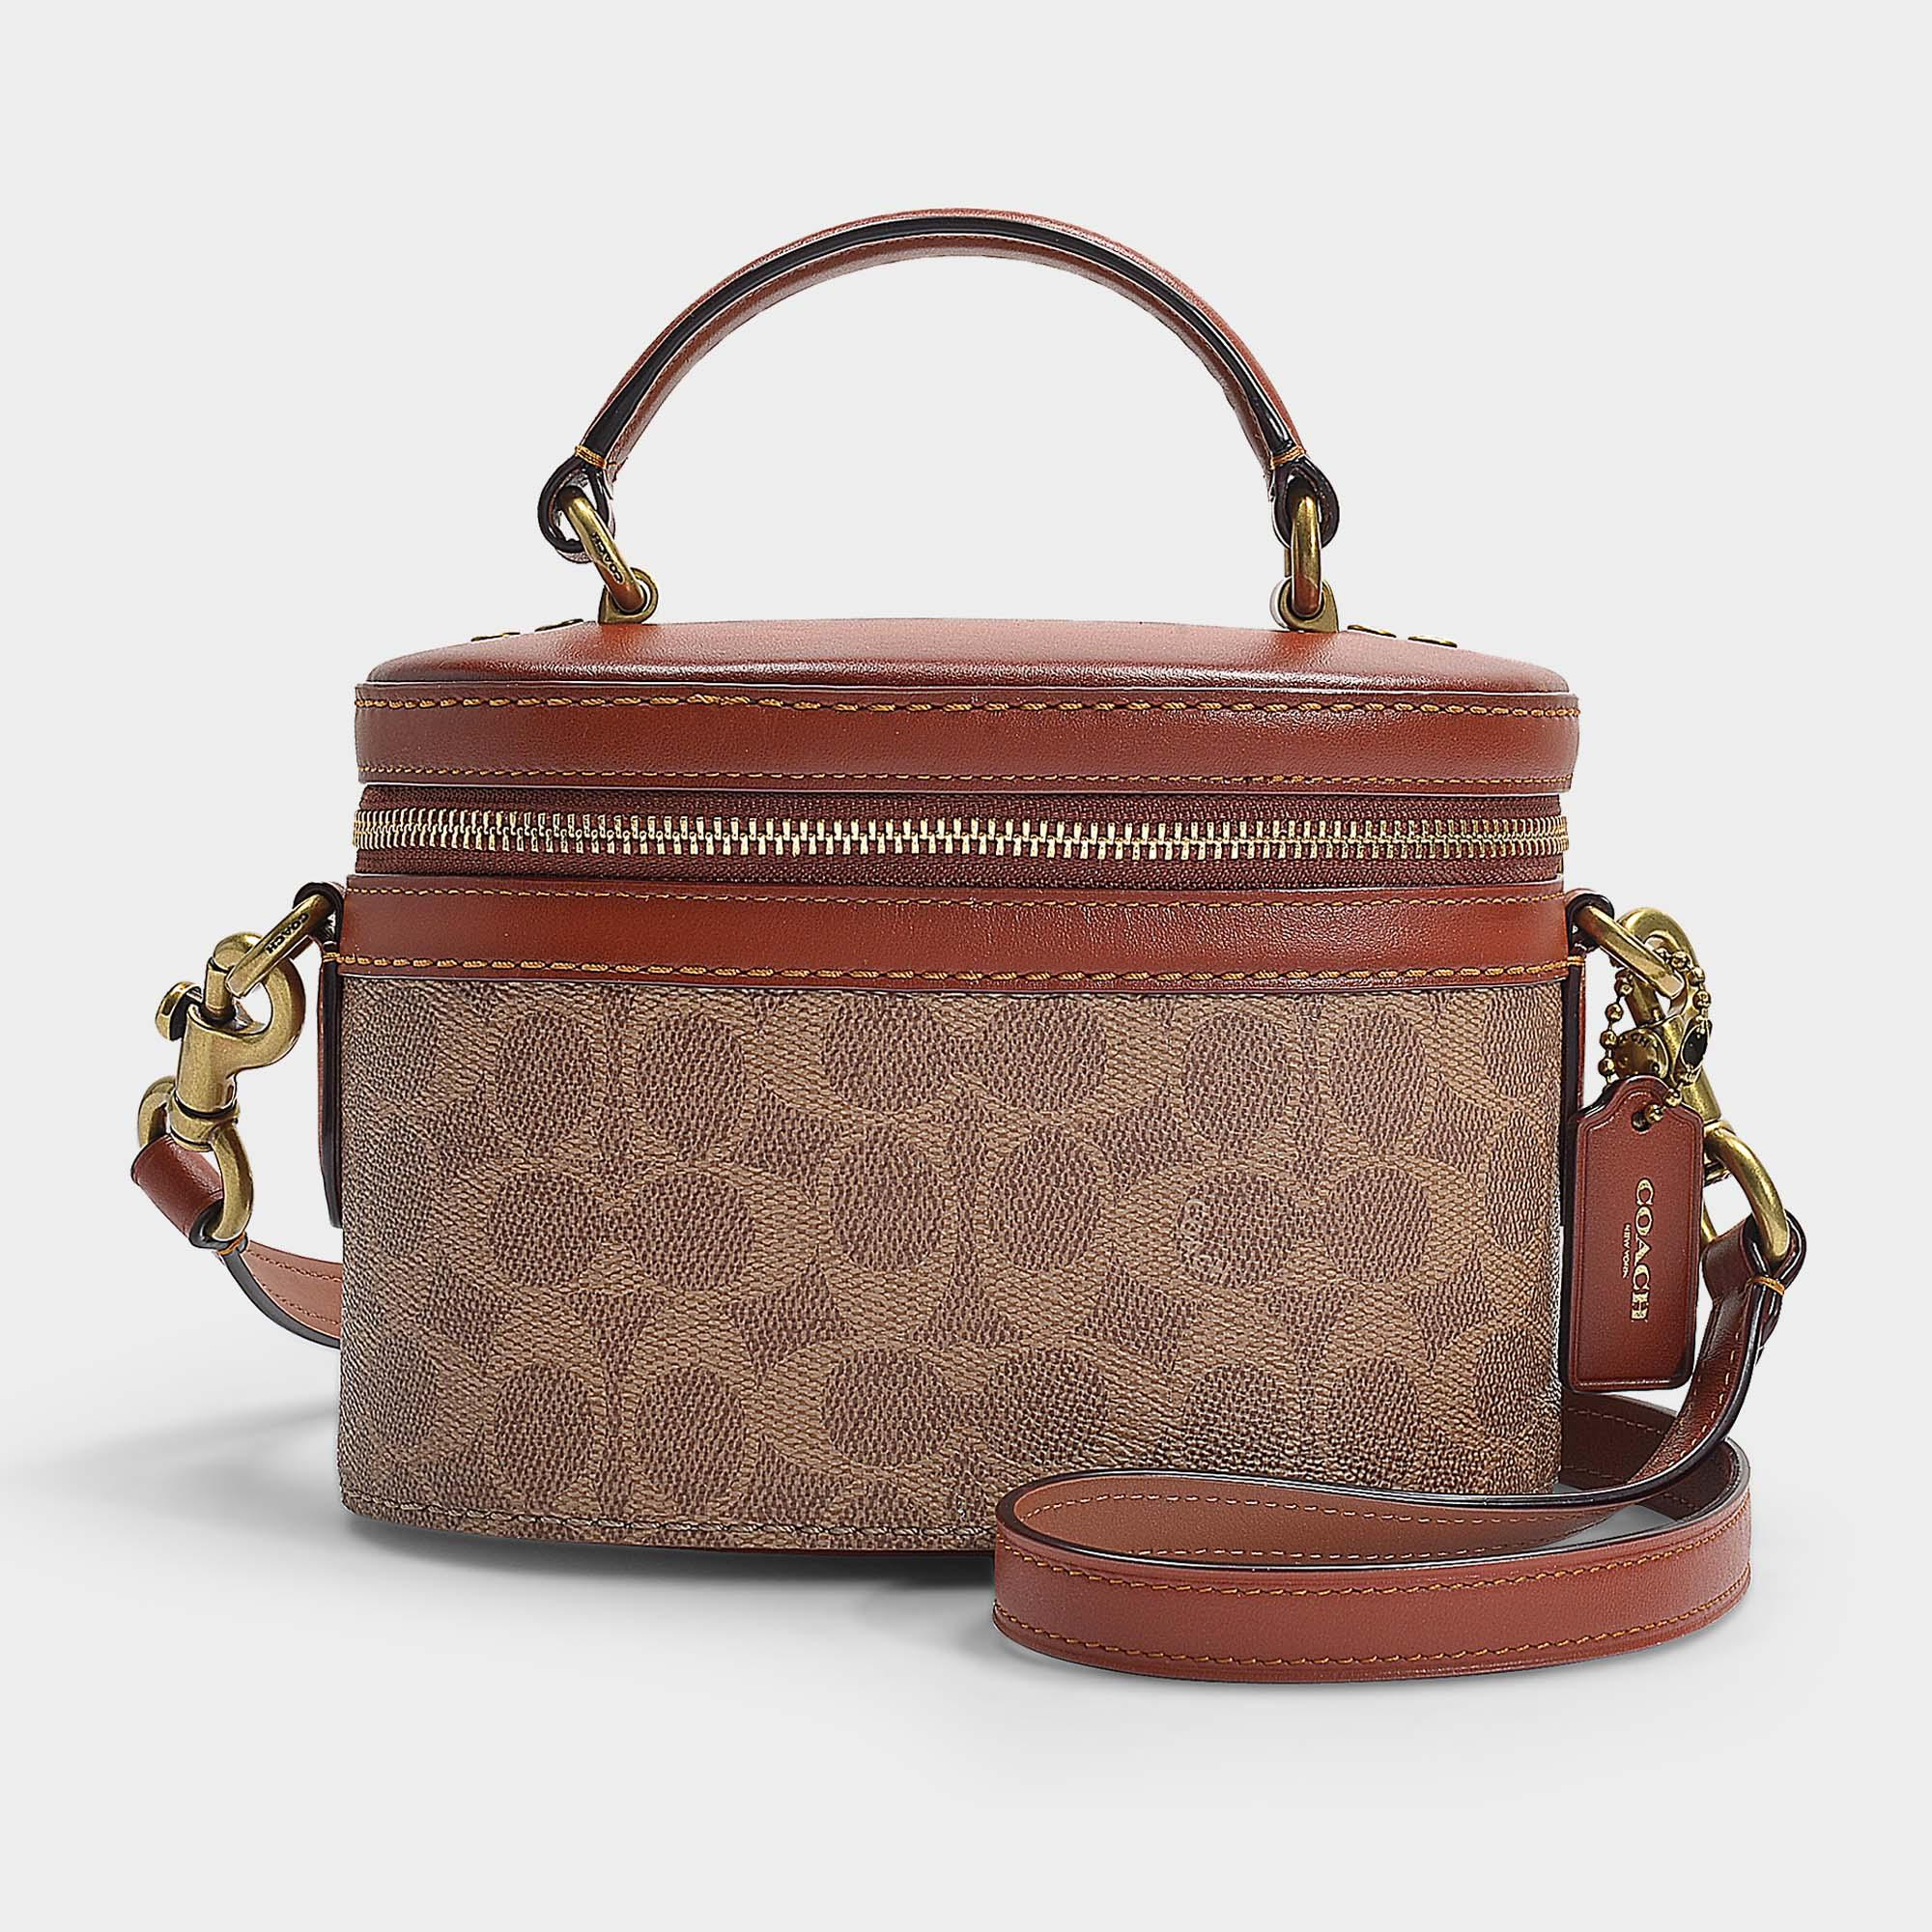 COACH. Women s Brown Signature Trail Crossbody Bag In Rust Signature Coated  Canvas e8f1dd09e2d28